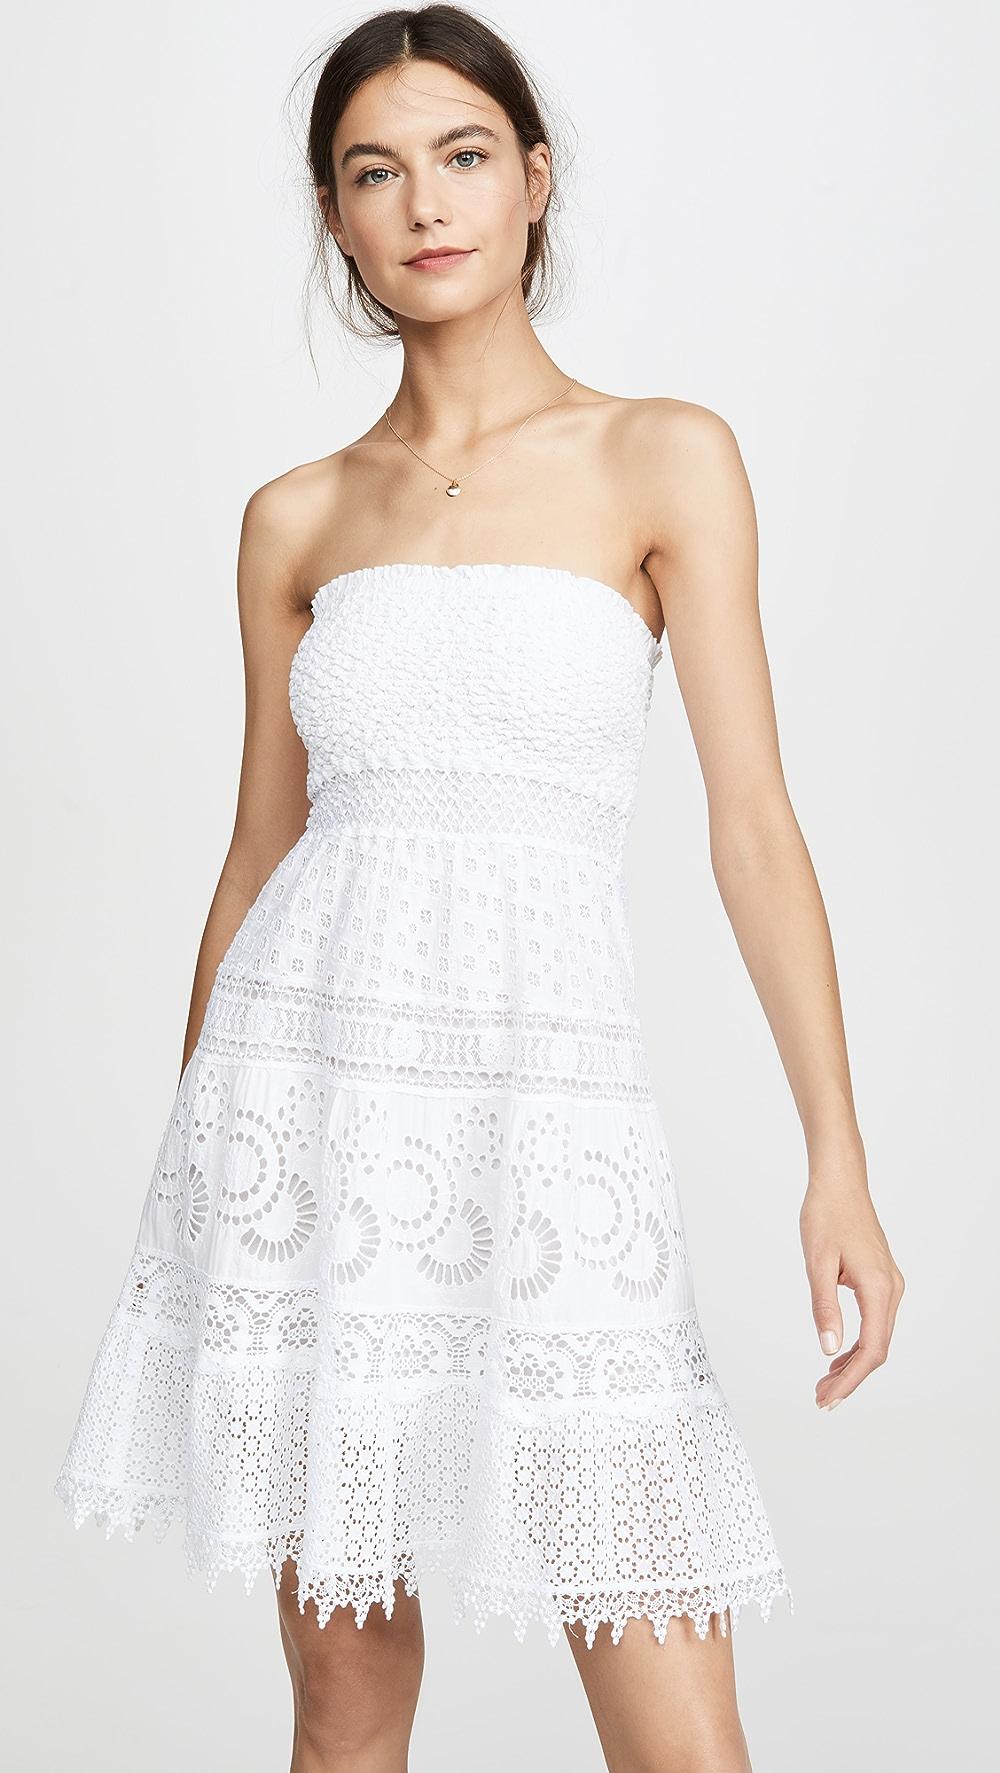 Cheap Price Temptation Positano - Ostia Mini Dress High Standard In Quality And Hygiene